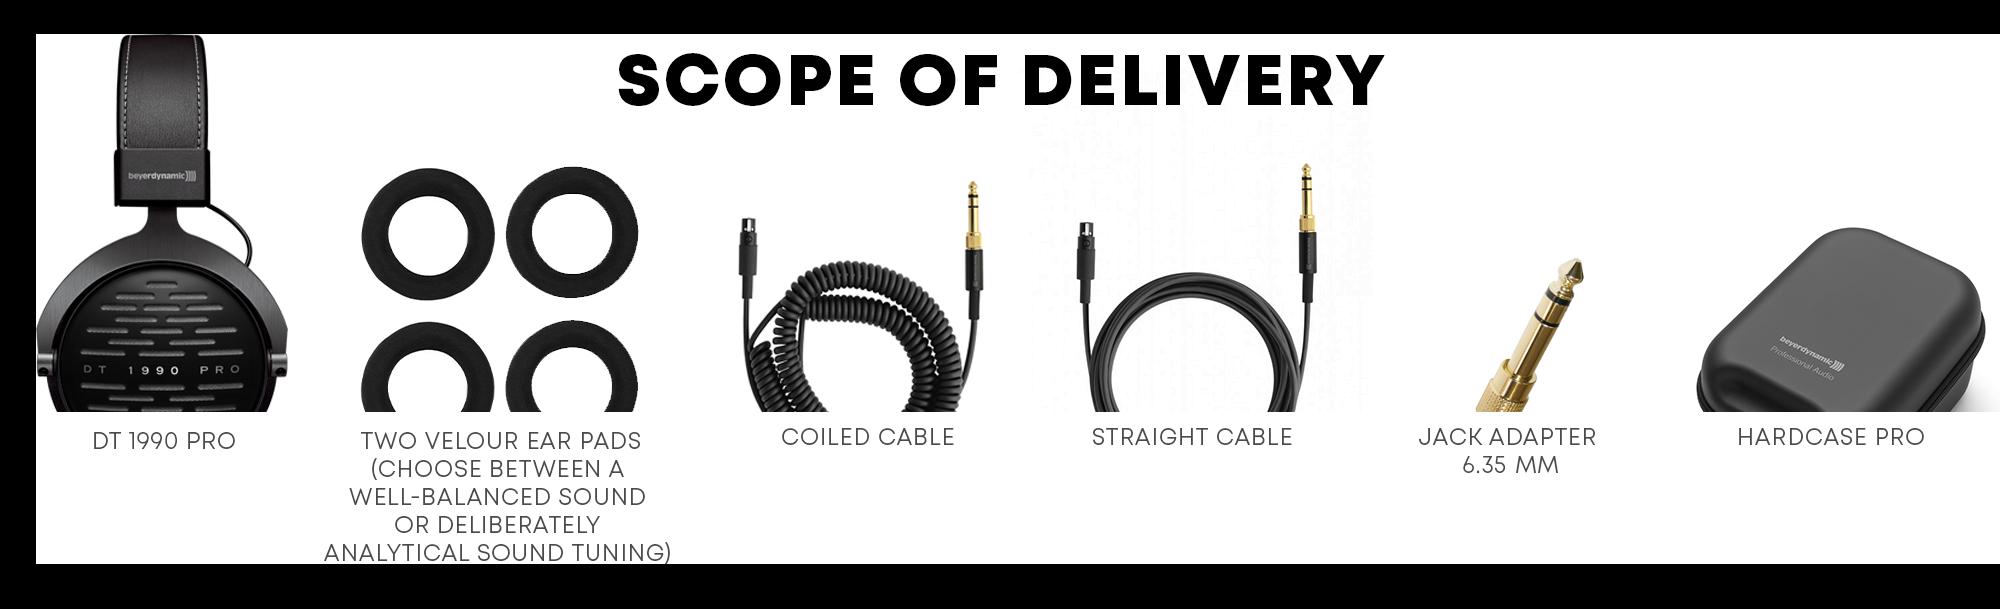 dt1990-5-xl-quer-en.png